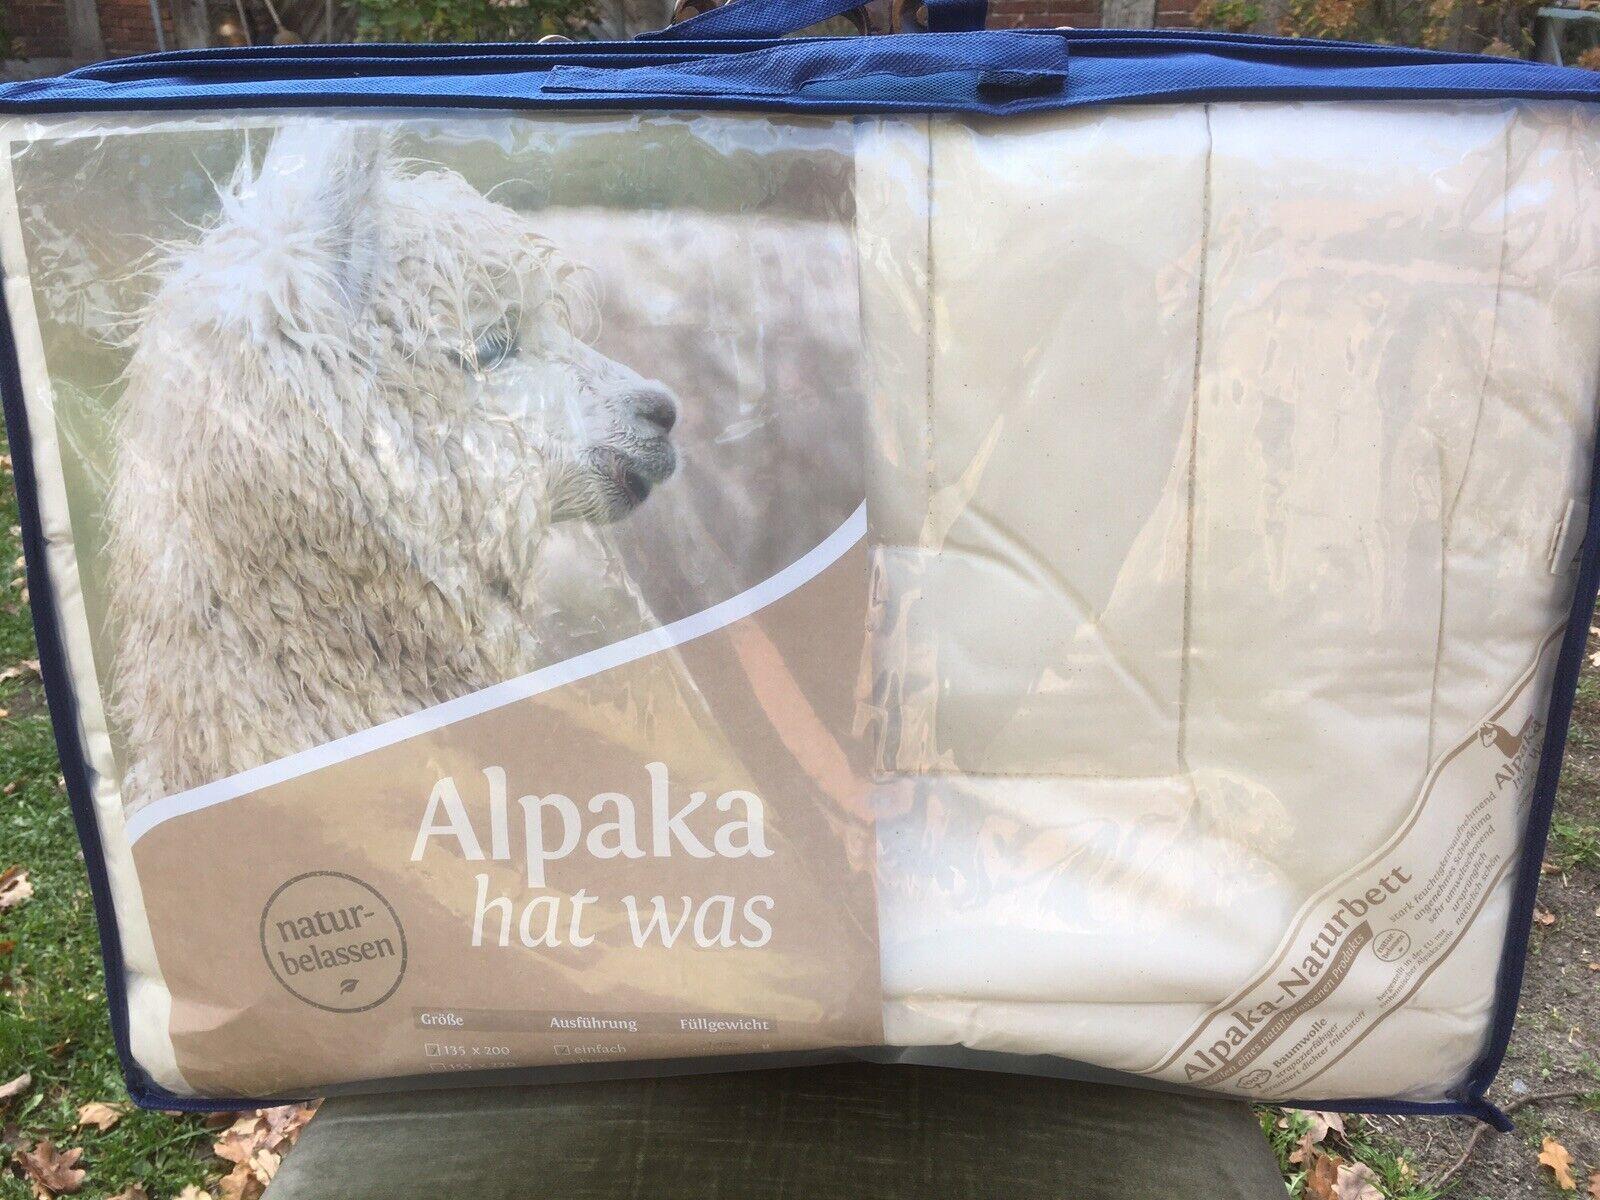 Alpaka Bettdecke 100% Alpakawolle 1100g Alpaka 135x 200 Steppbett Naturbett